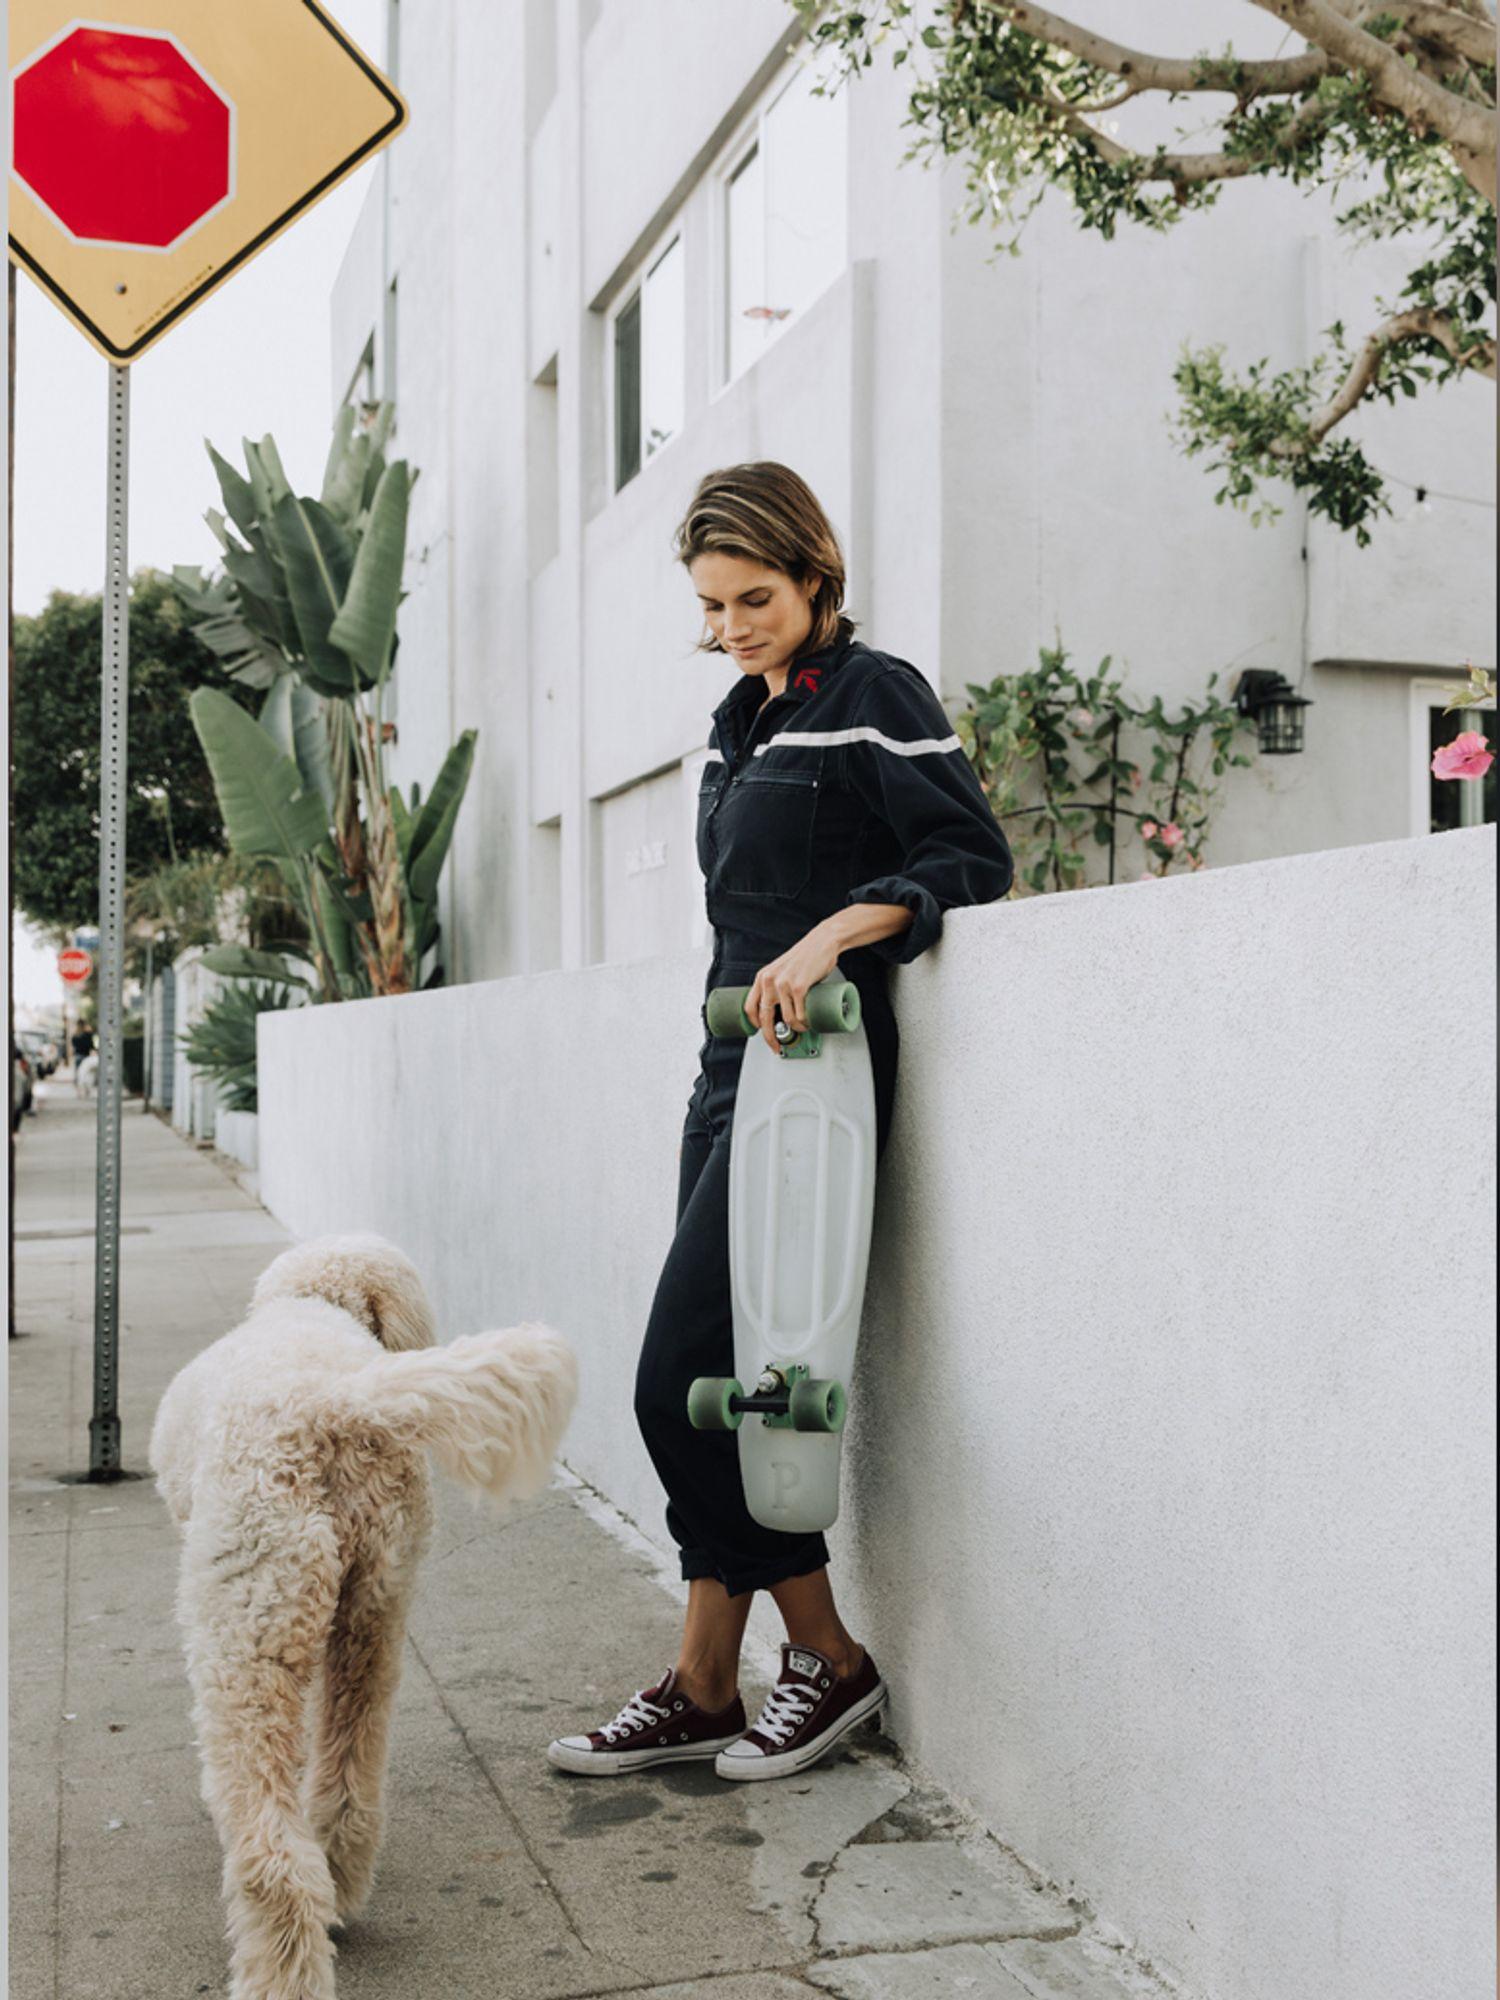 Missy Peregrym with a skateboard and a dog